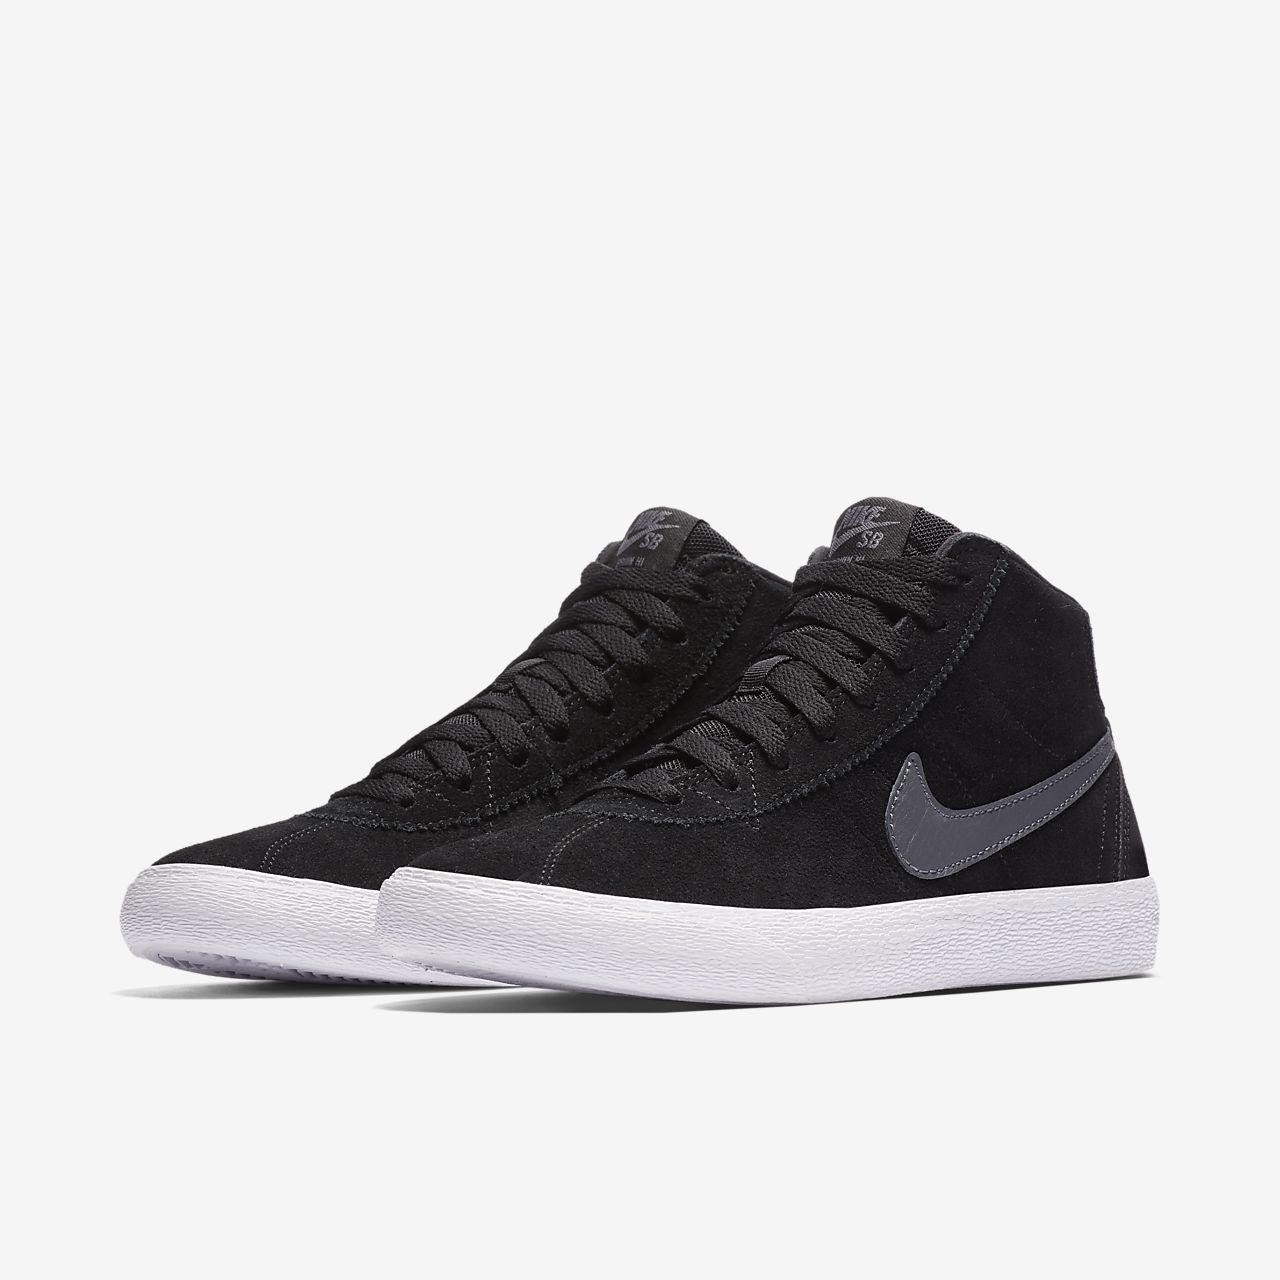 Nike Blazers Lowrider Noir Et Blanc